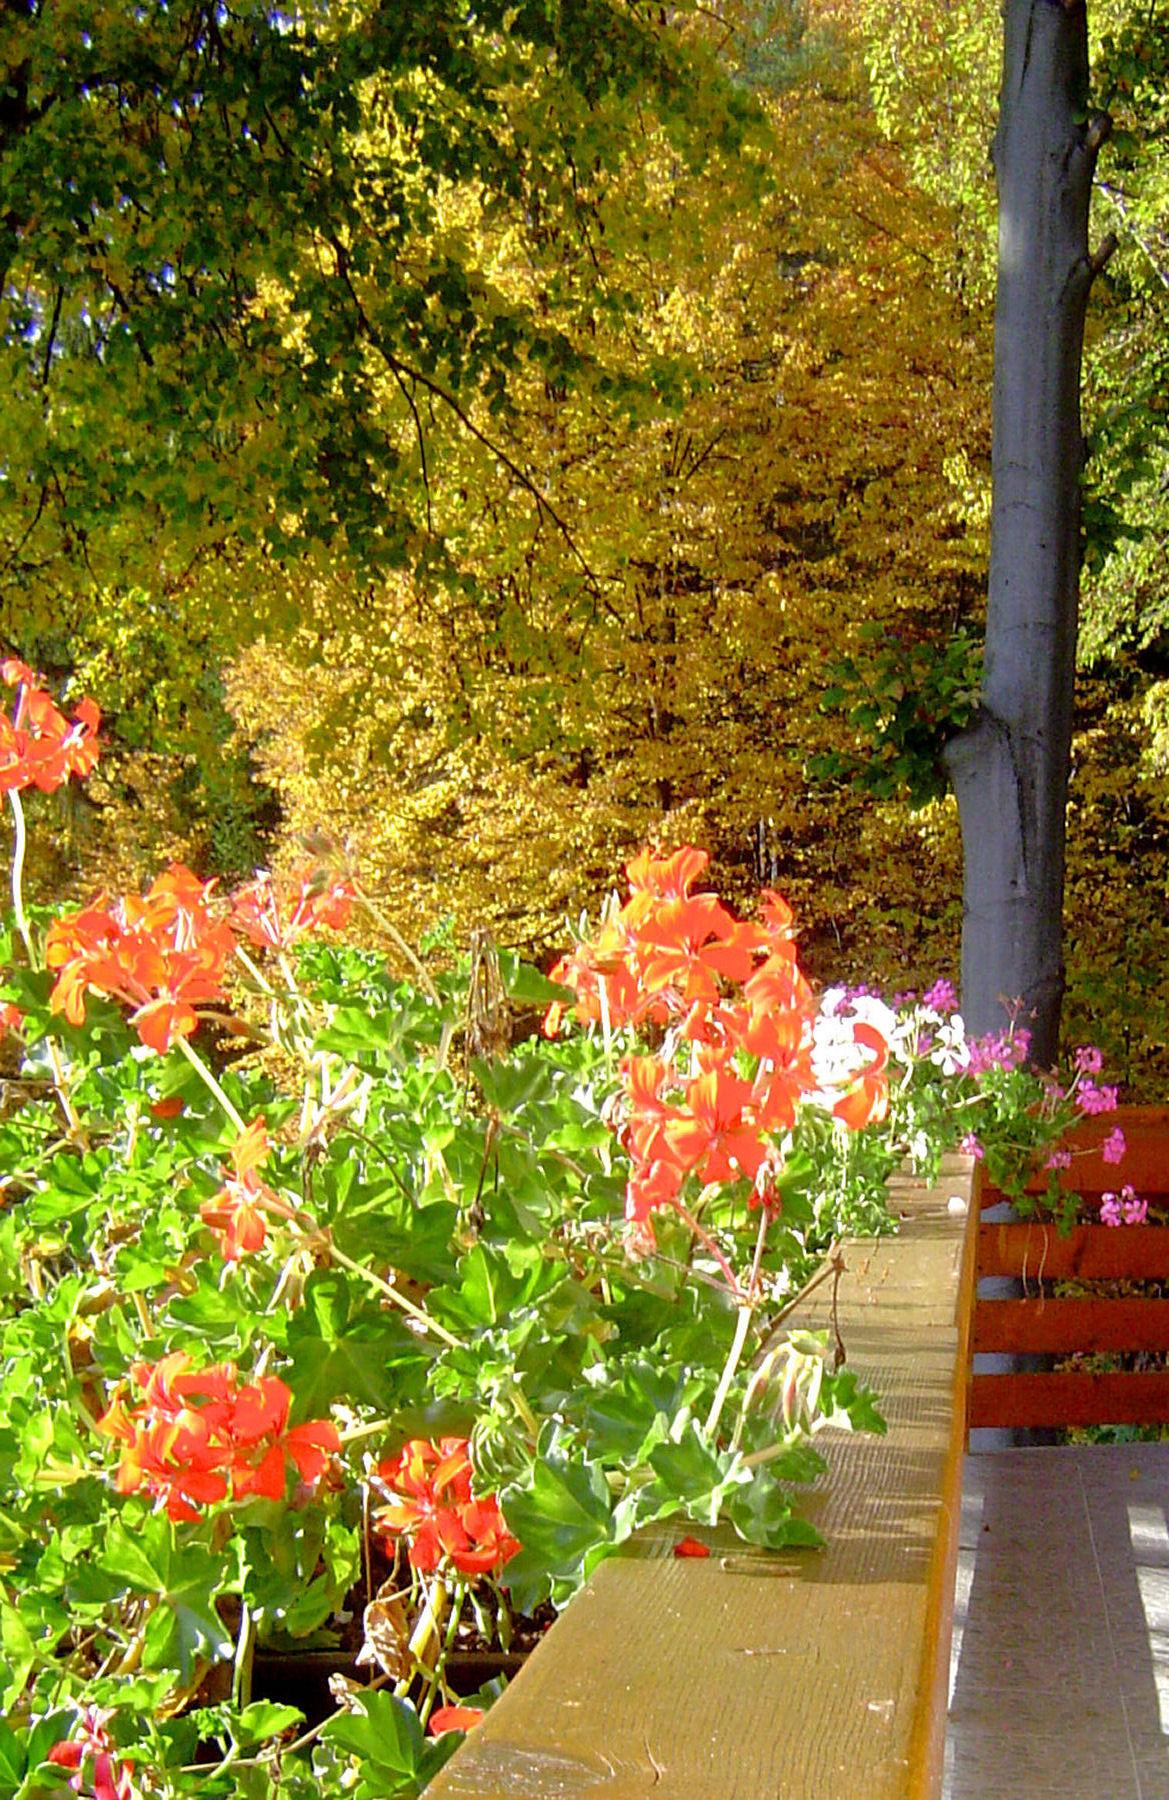 autumn-nature-slovenia-015-1